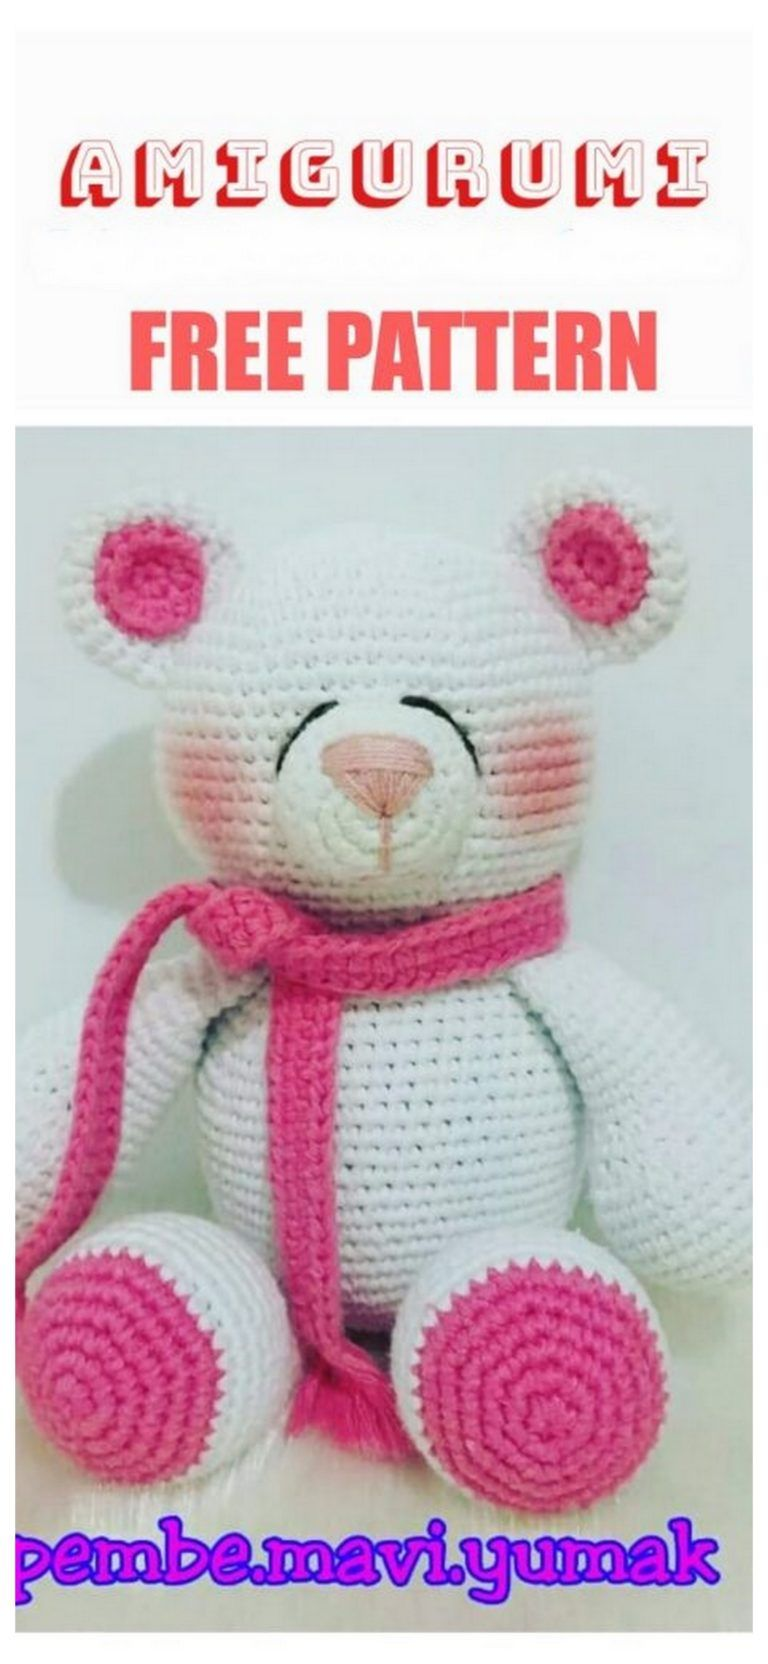 Amigurumi Fat Teddy Bear Free Crochet Pattern - Amigurumi Free Patterns #teddybearpatterns